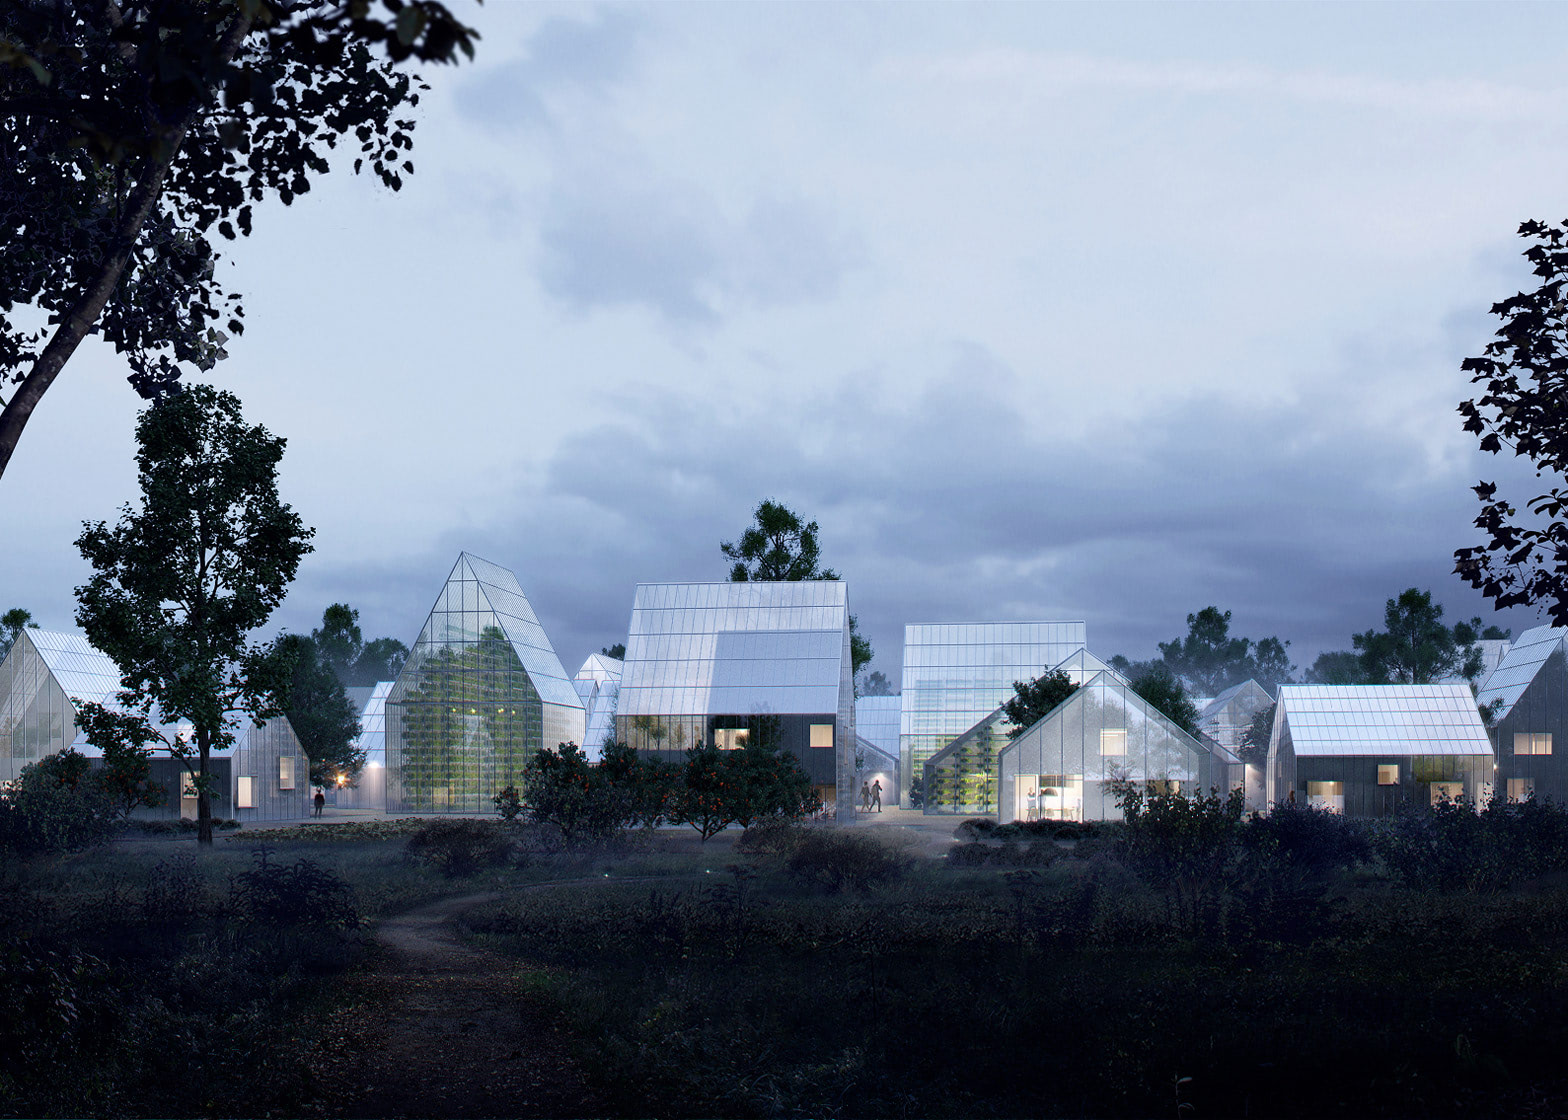 Visual of ReGen, the Autarchic Off-Grid Village